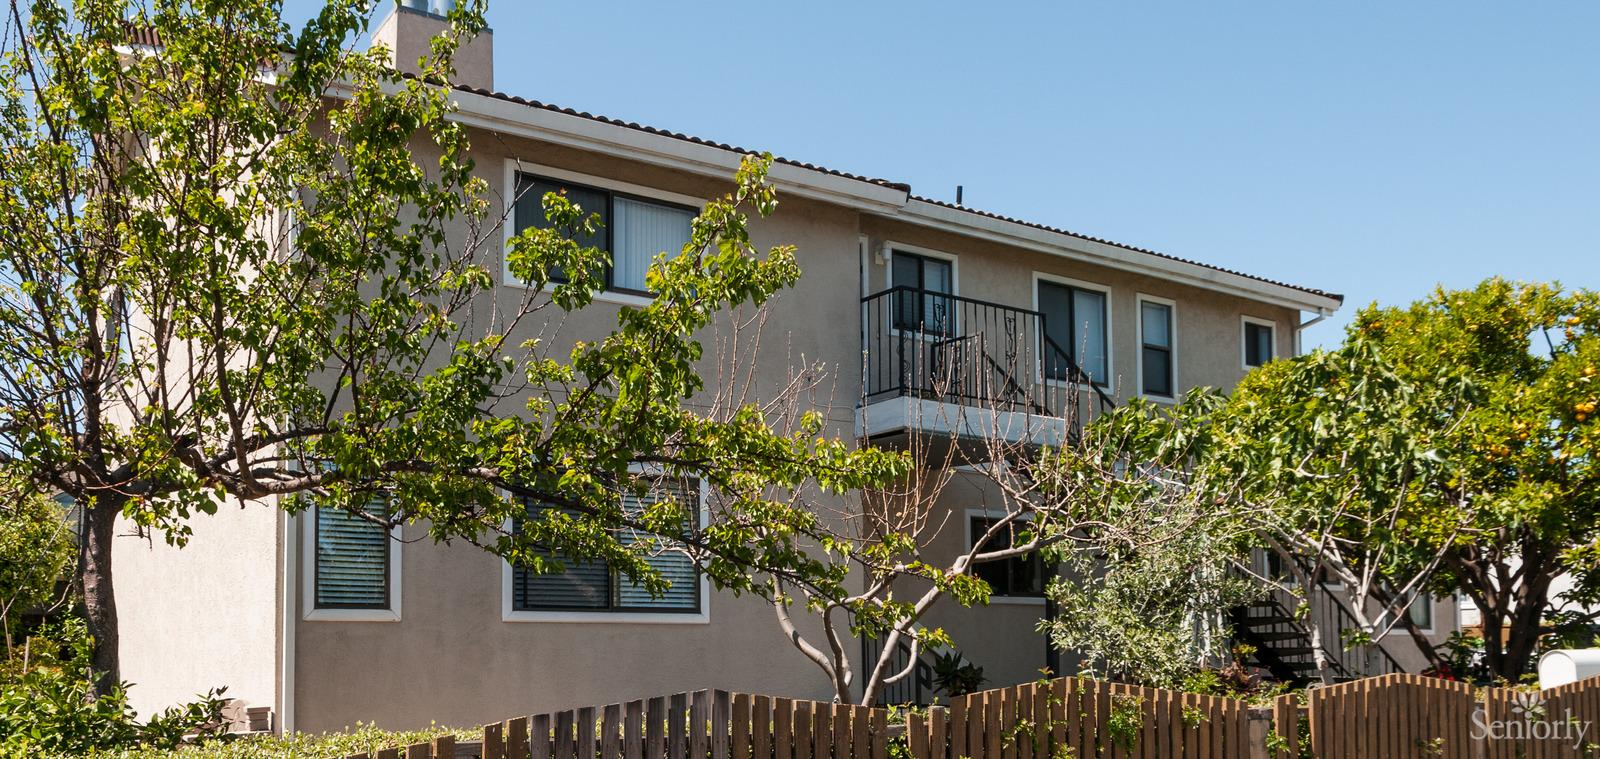 B&B Residential Facilities (3824) San Mateo CA 1